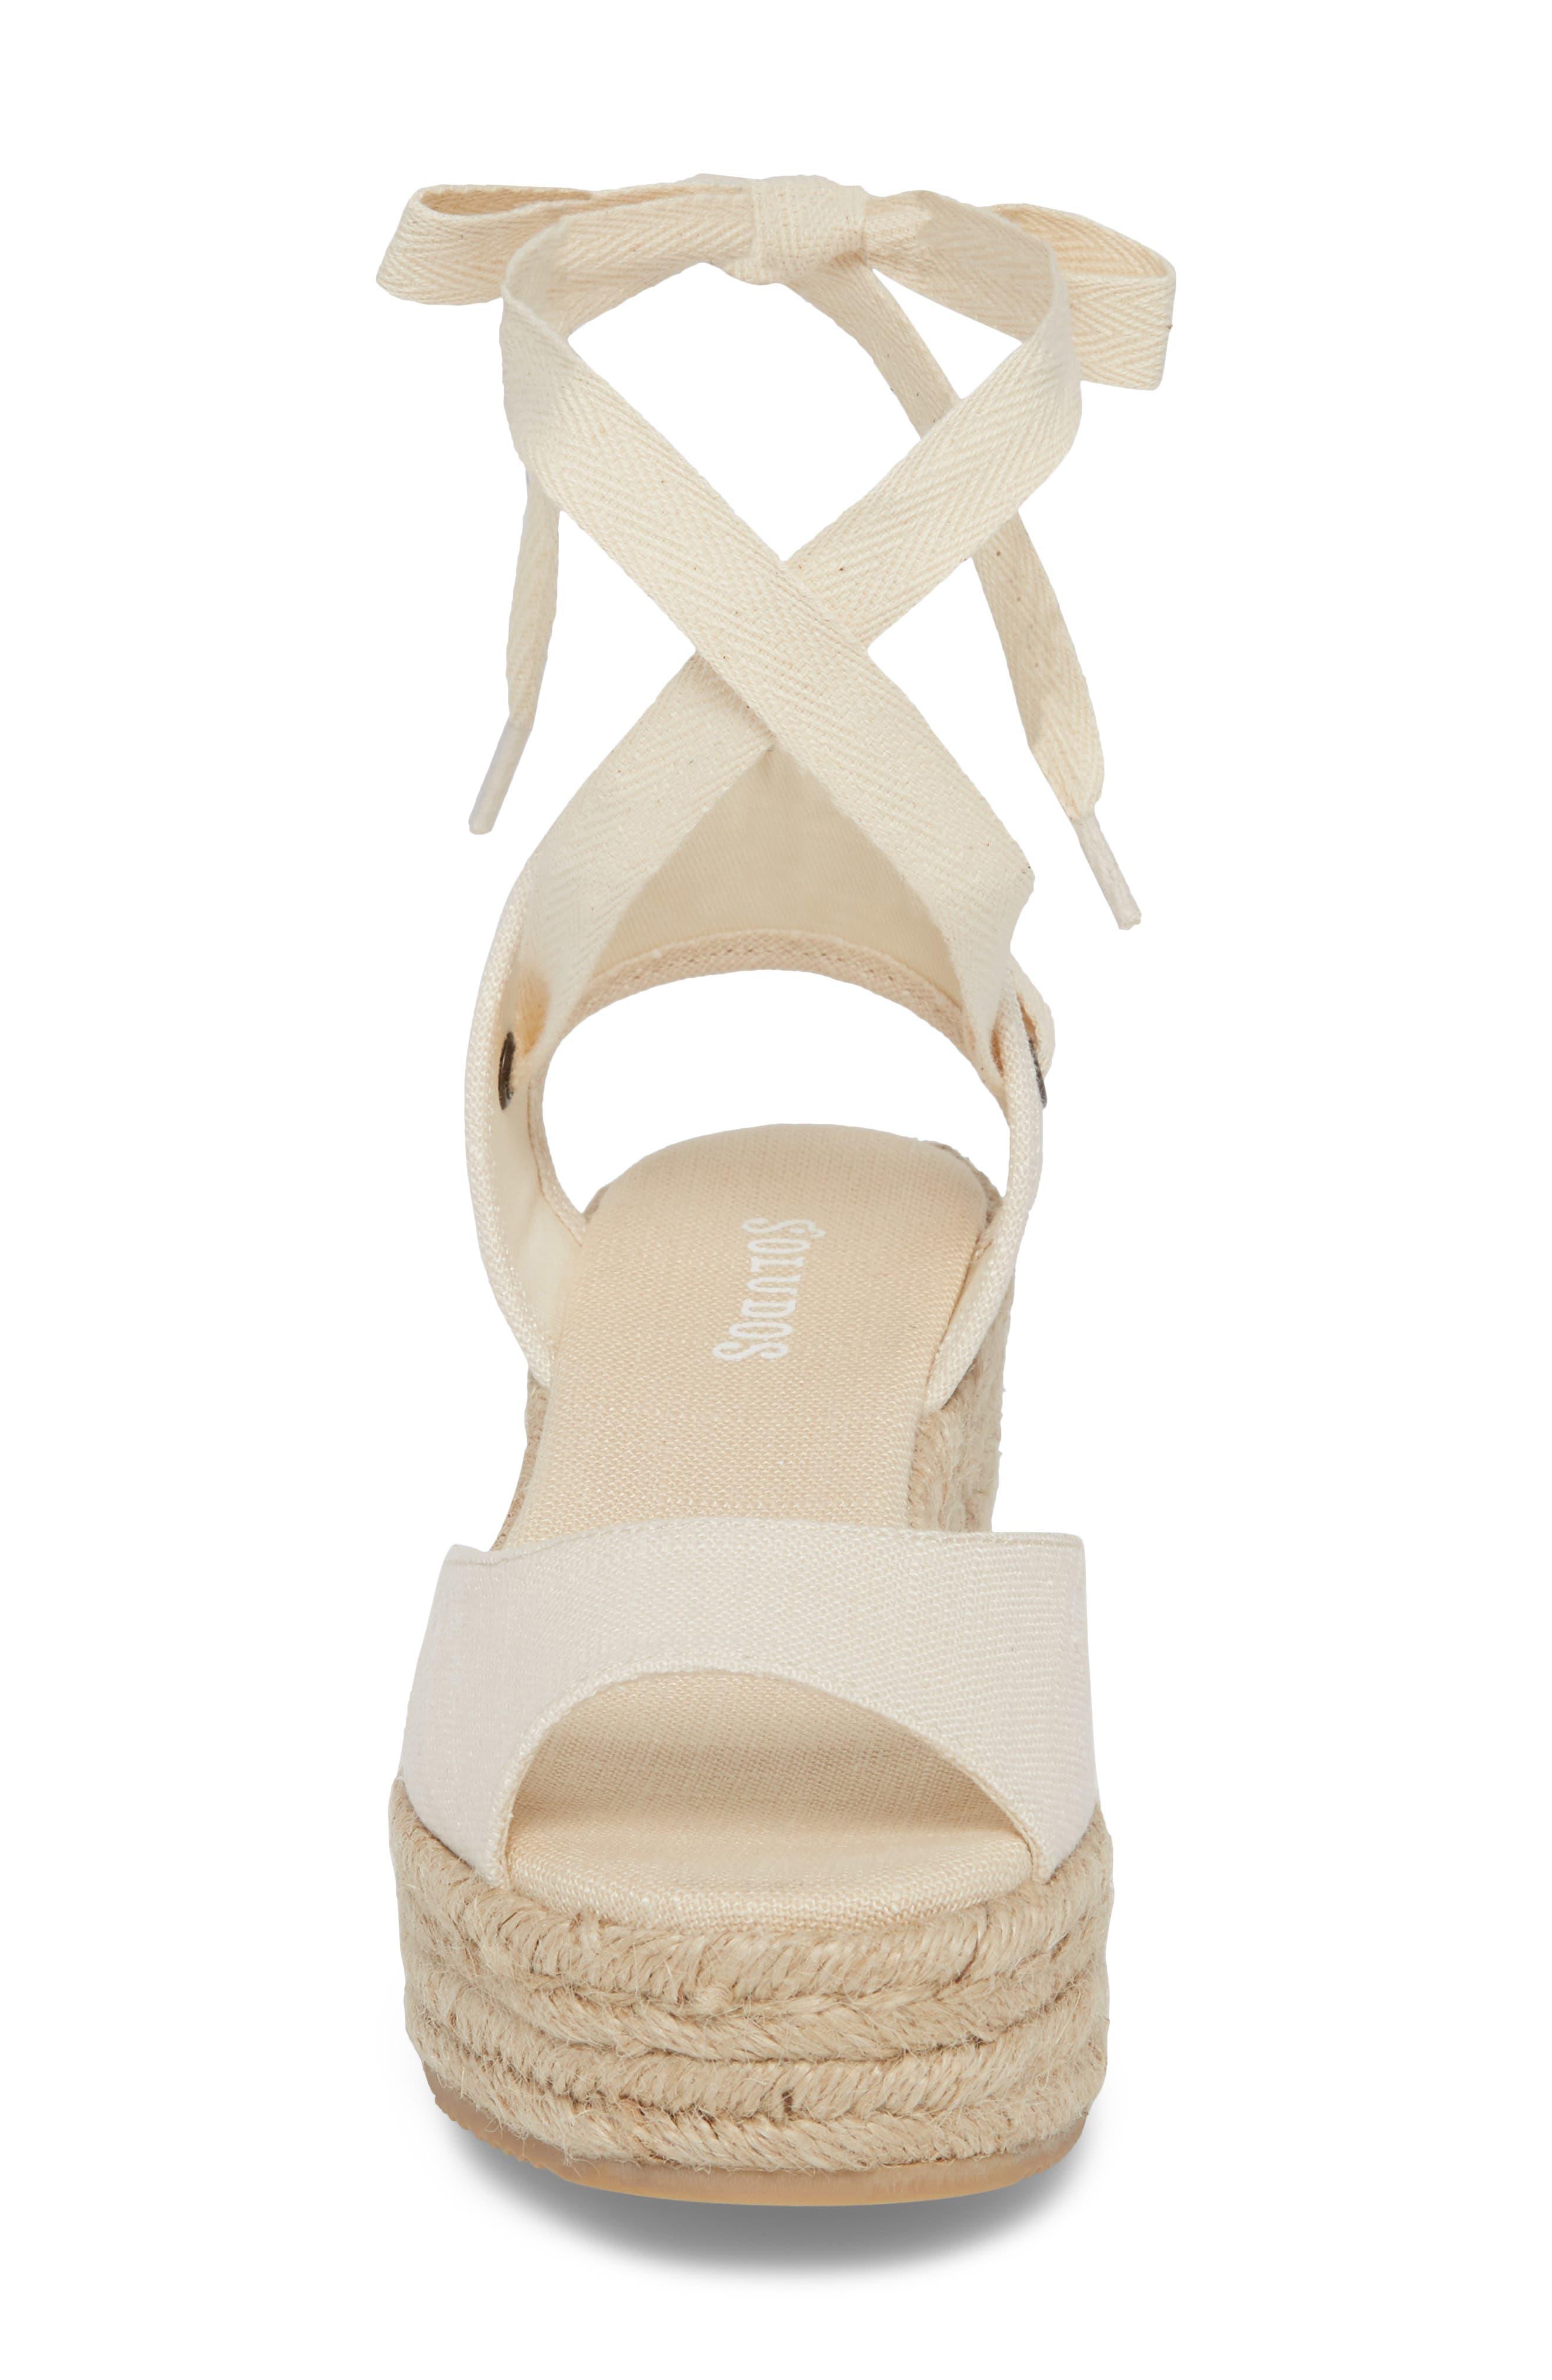 Espadrille Platform Sandal,                             Alternate thumbnail 4, color,                             Blush Fabric